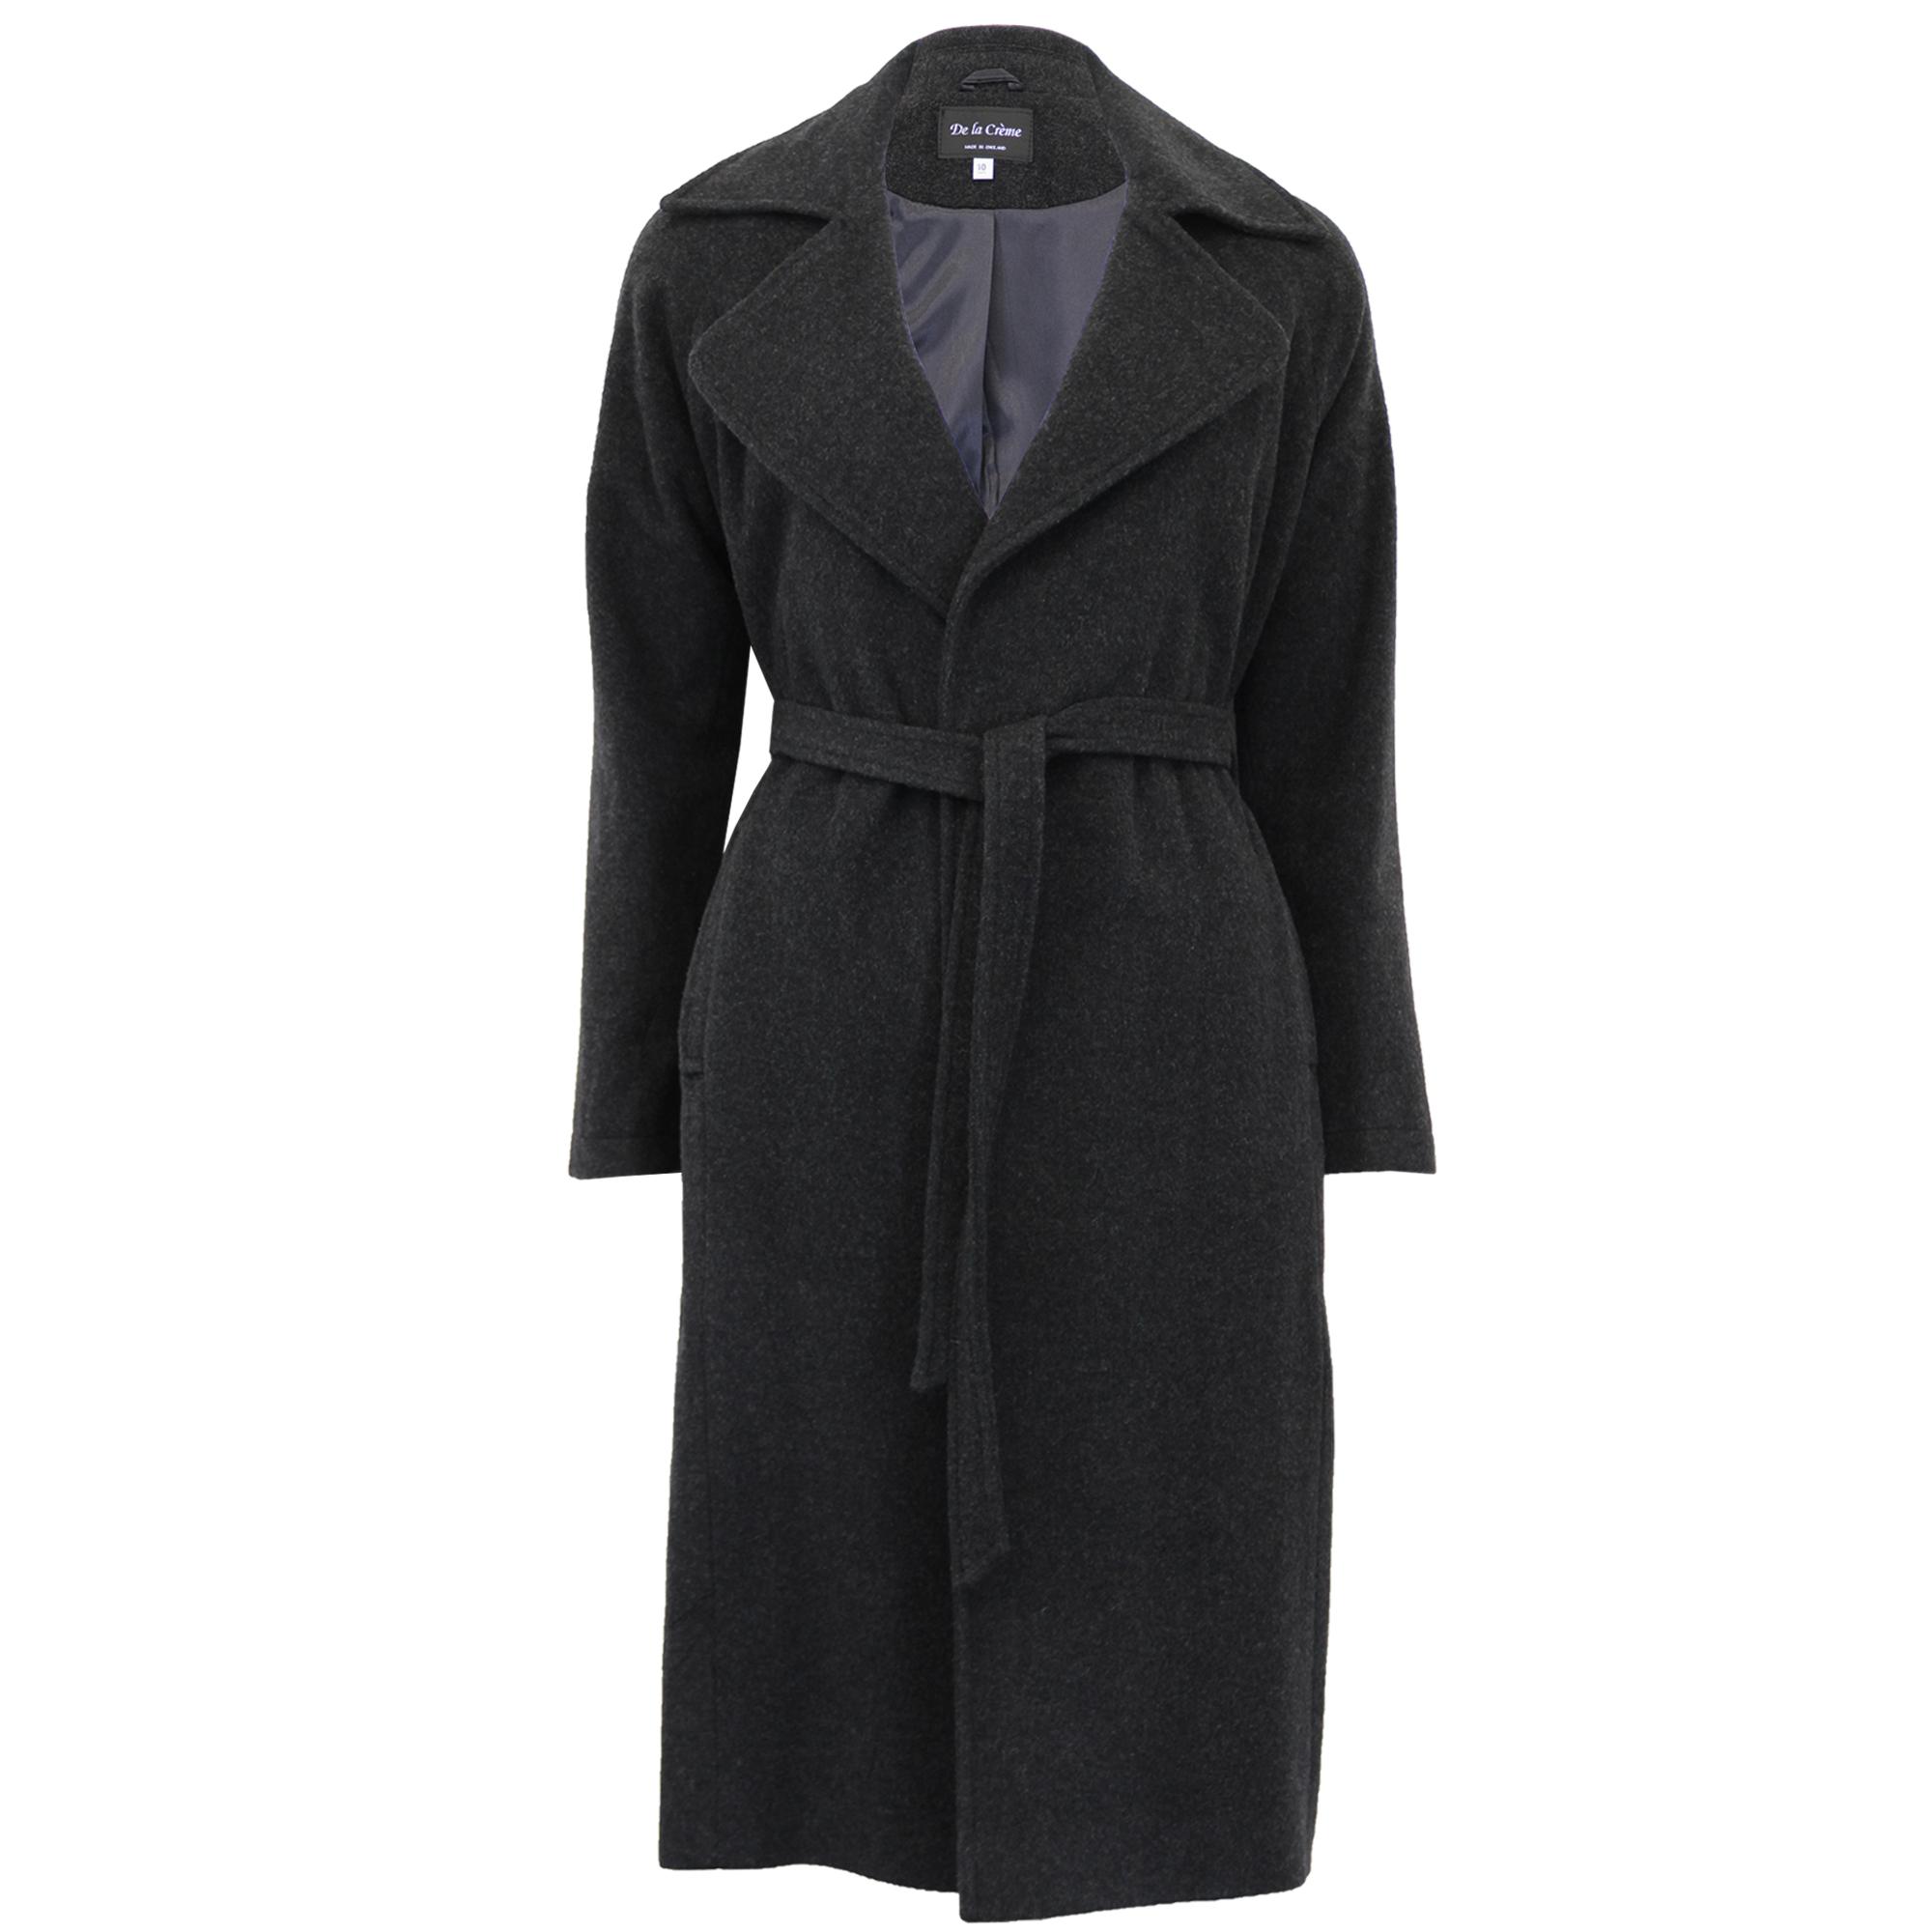 Fashion week Cashmere Casual coats for women for girls